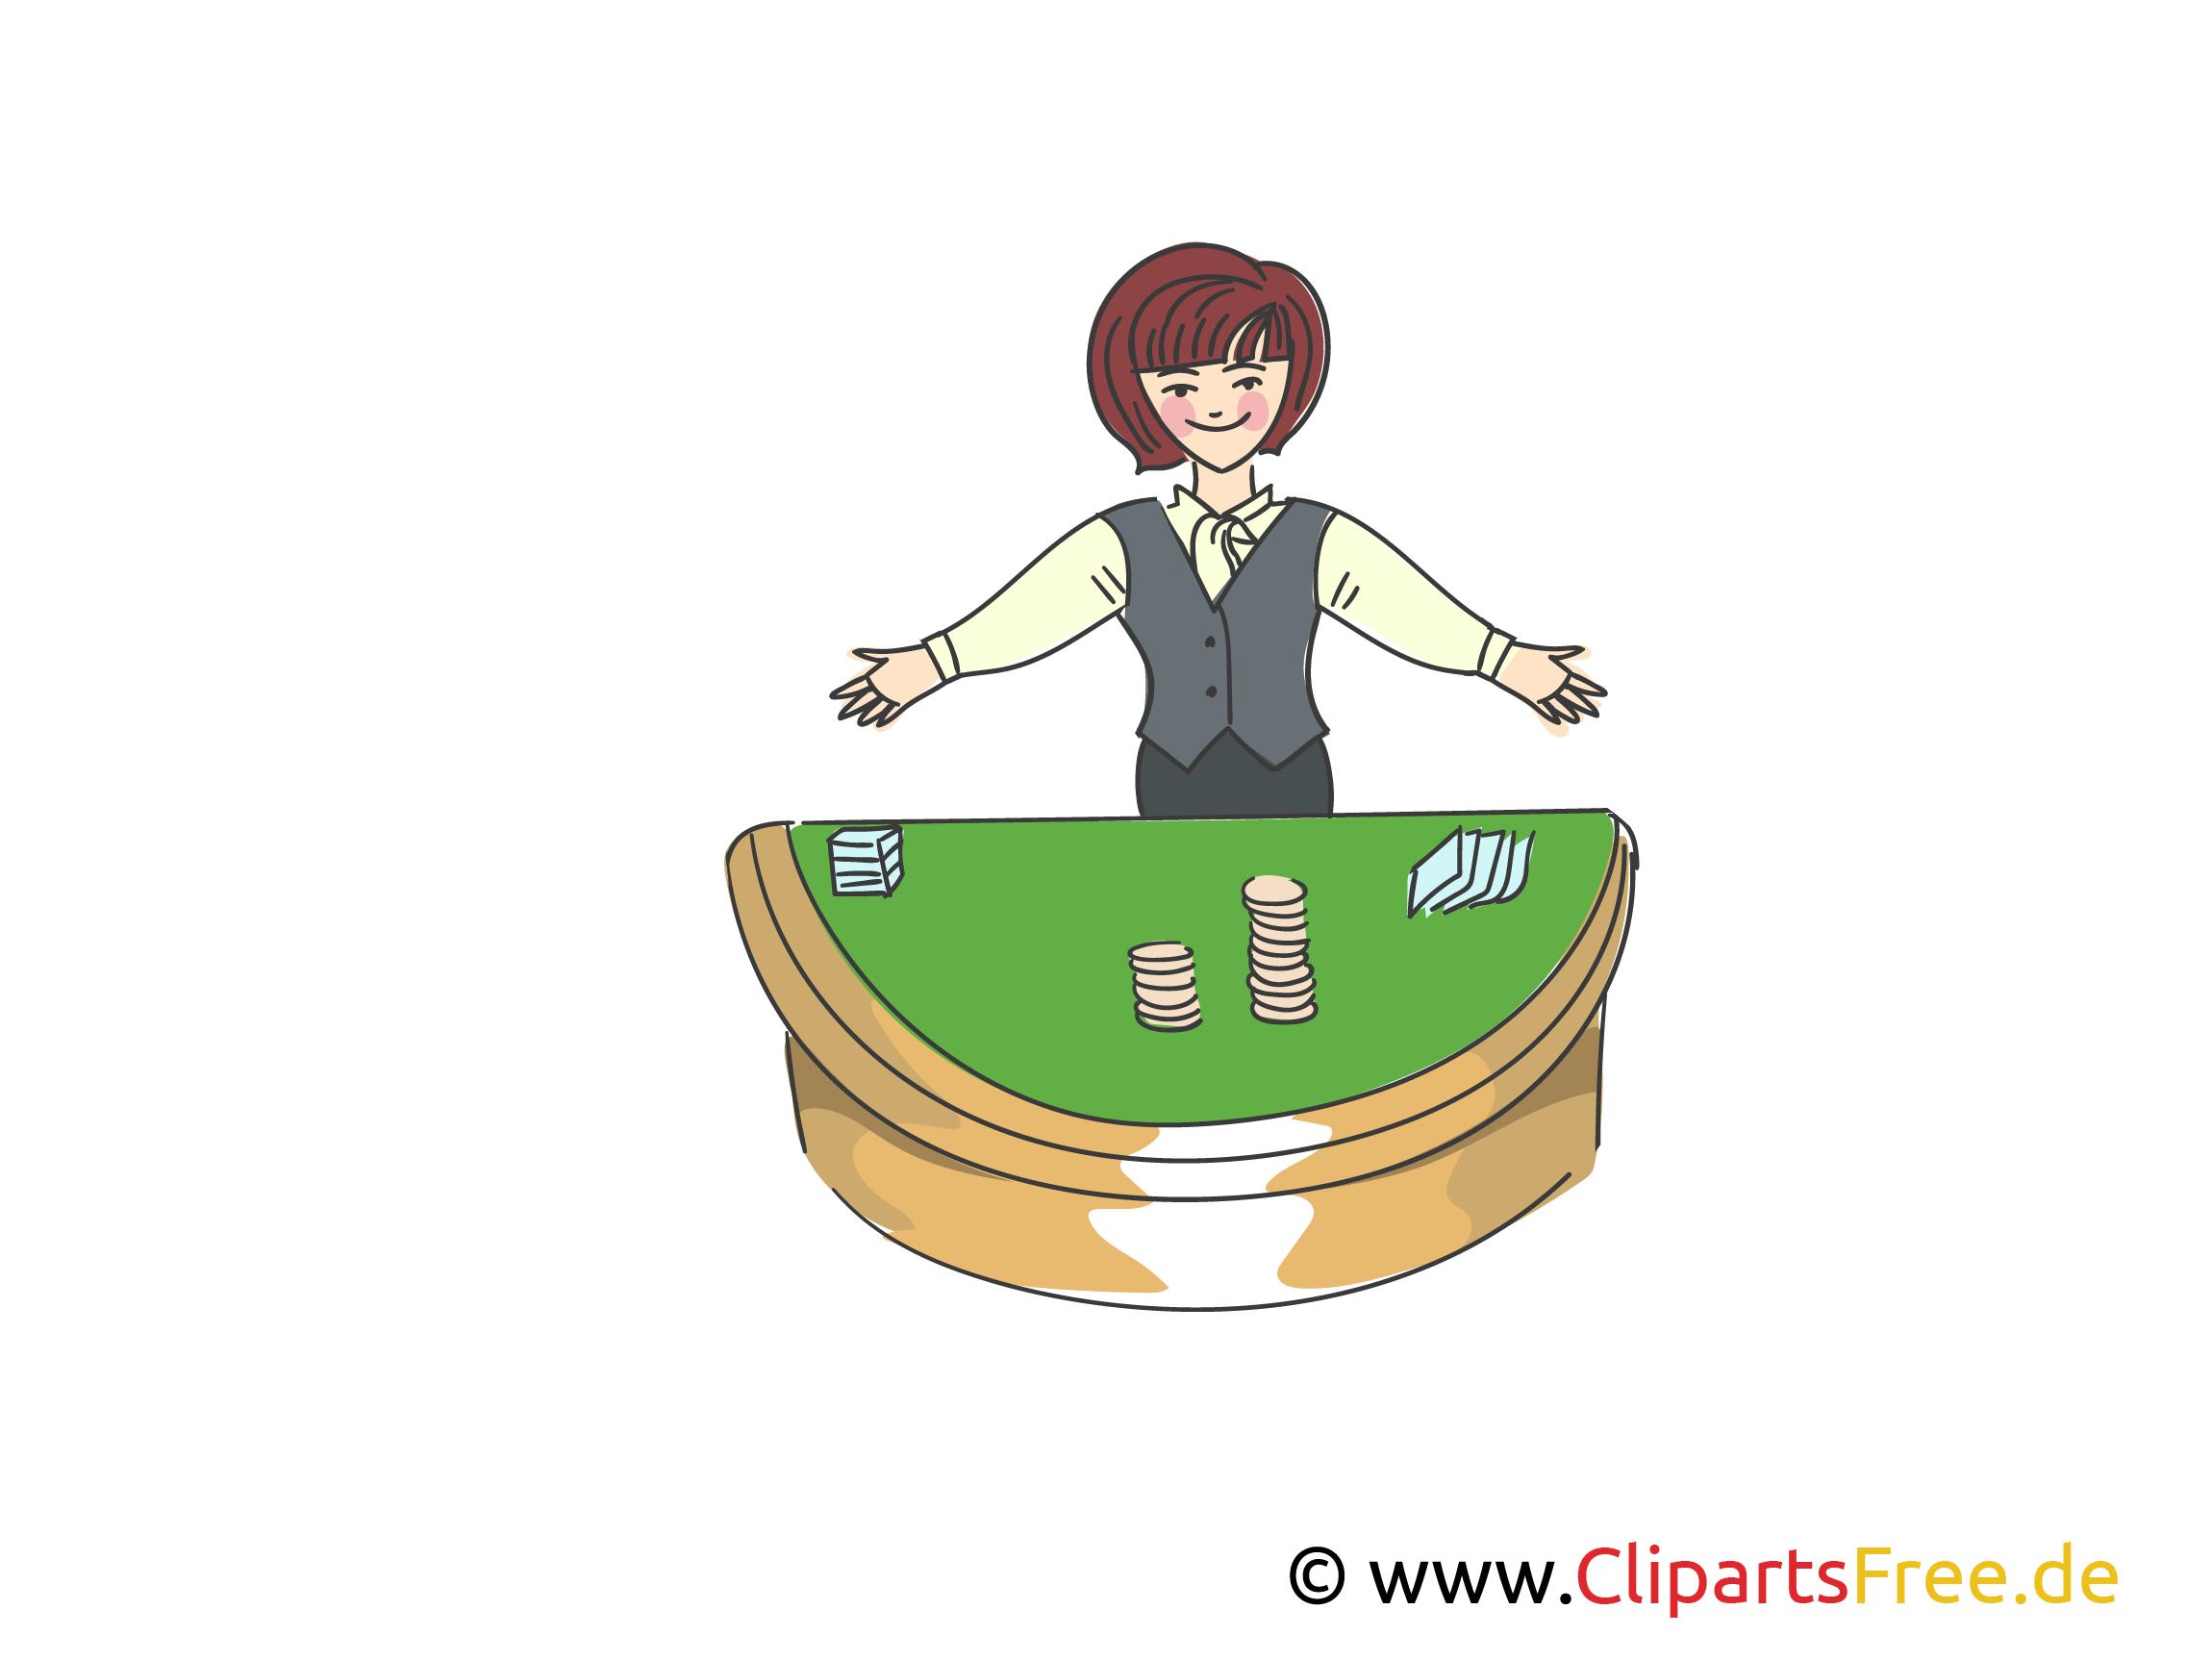 Croupier Frau in Casino Clipart, Bild, Illustration